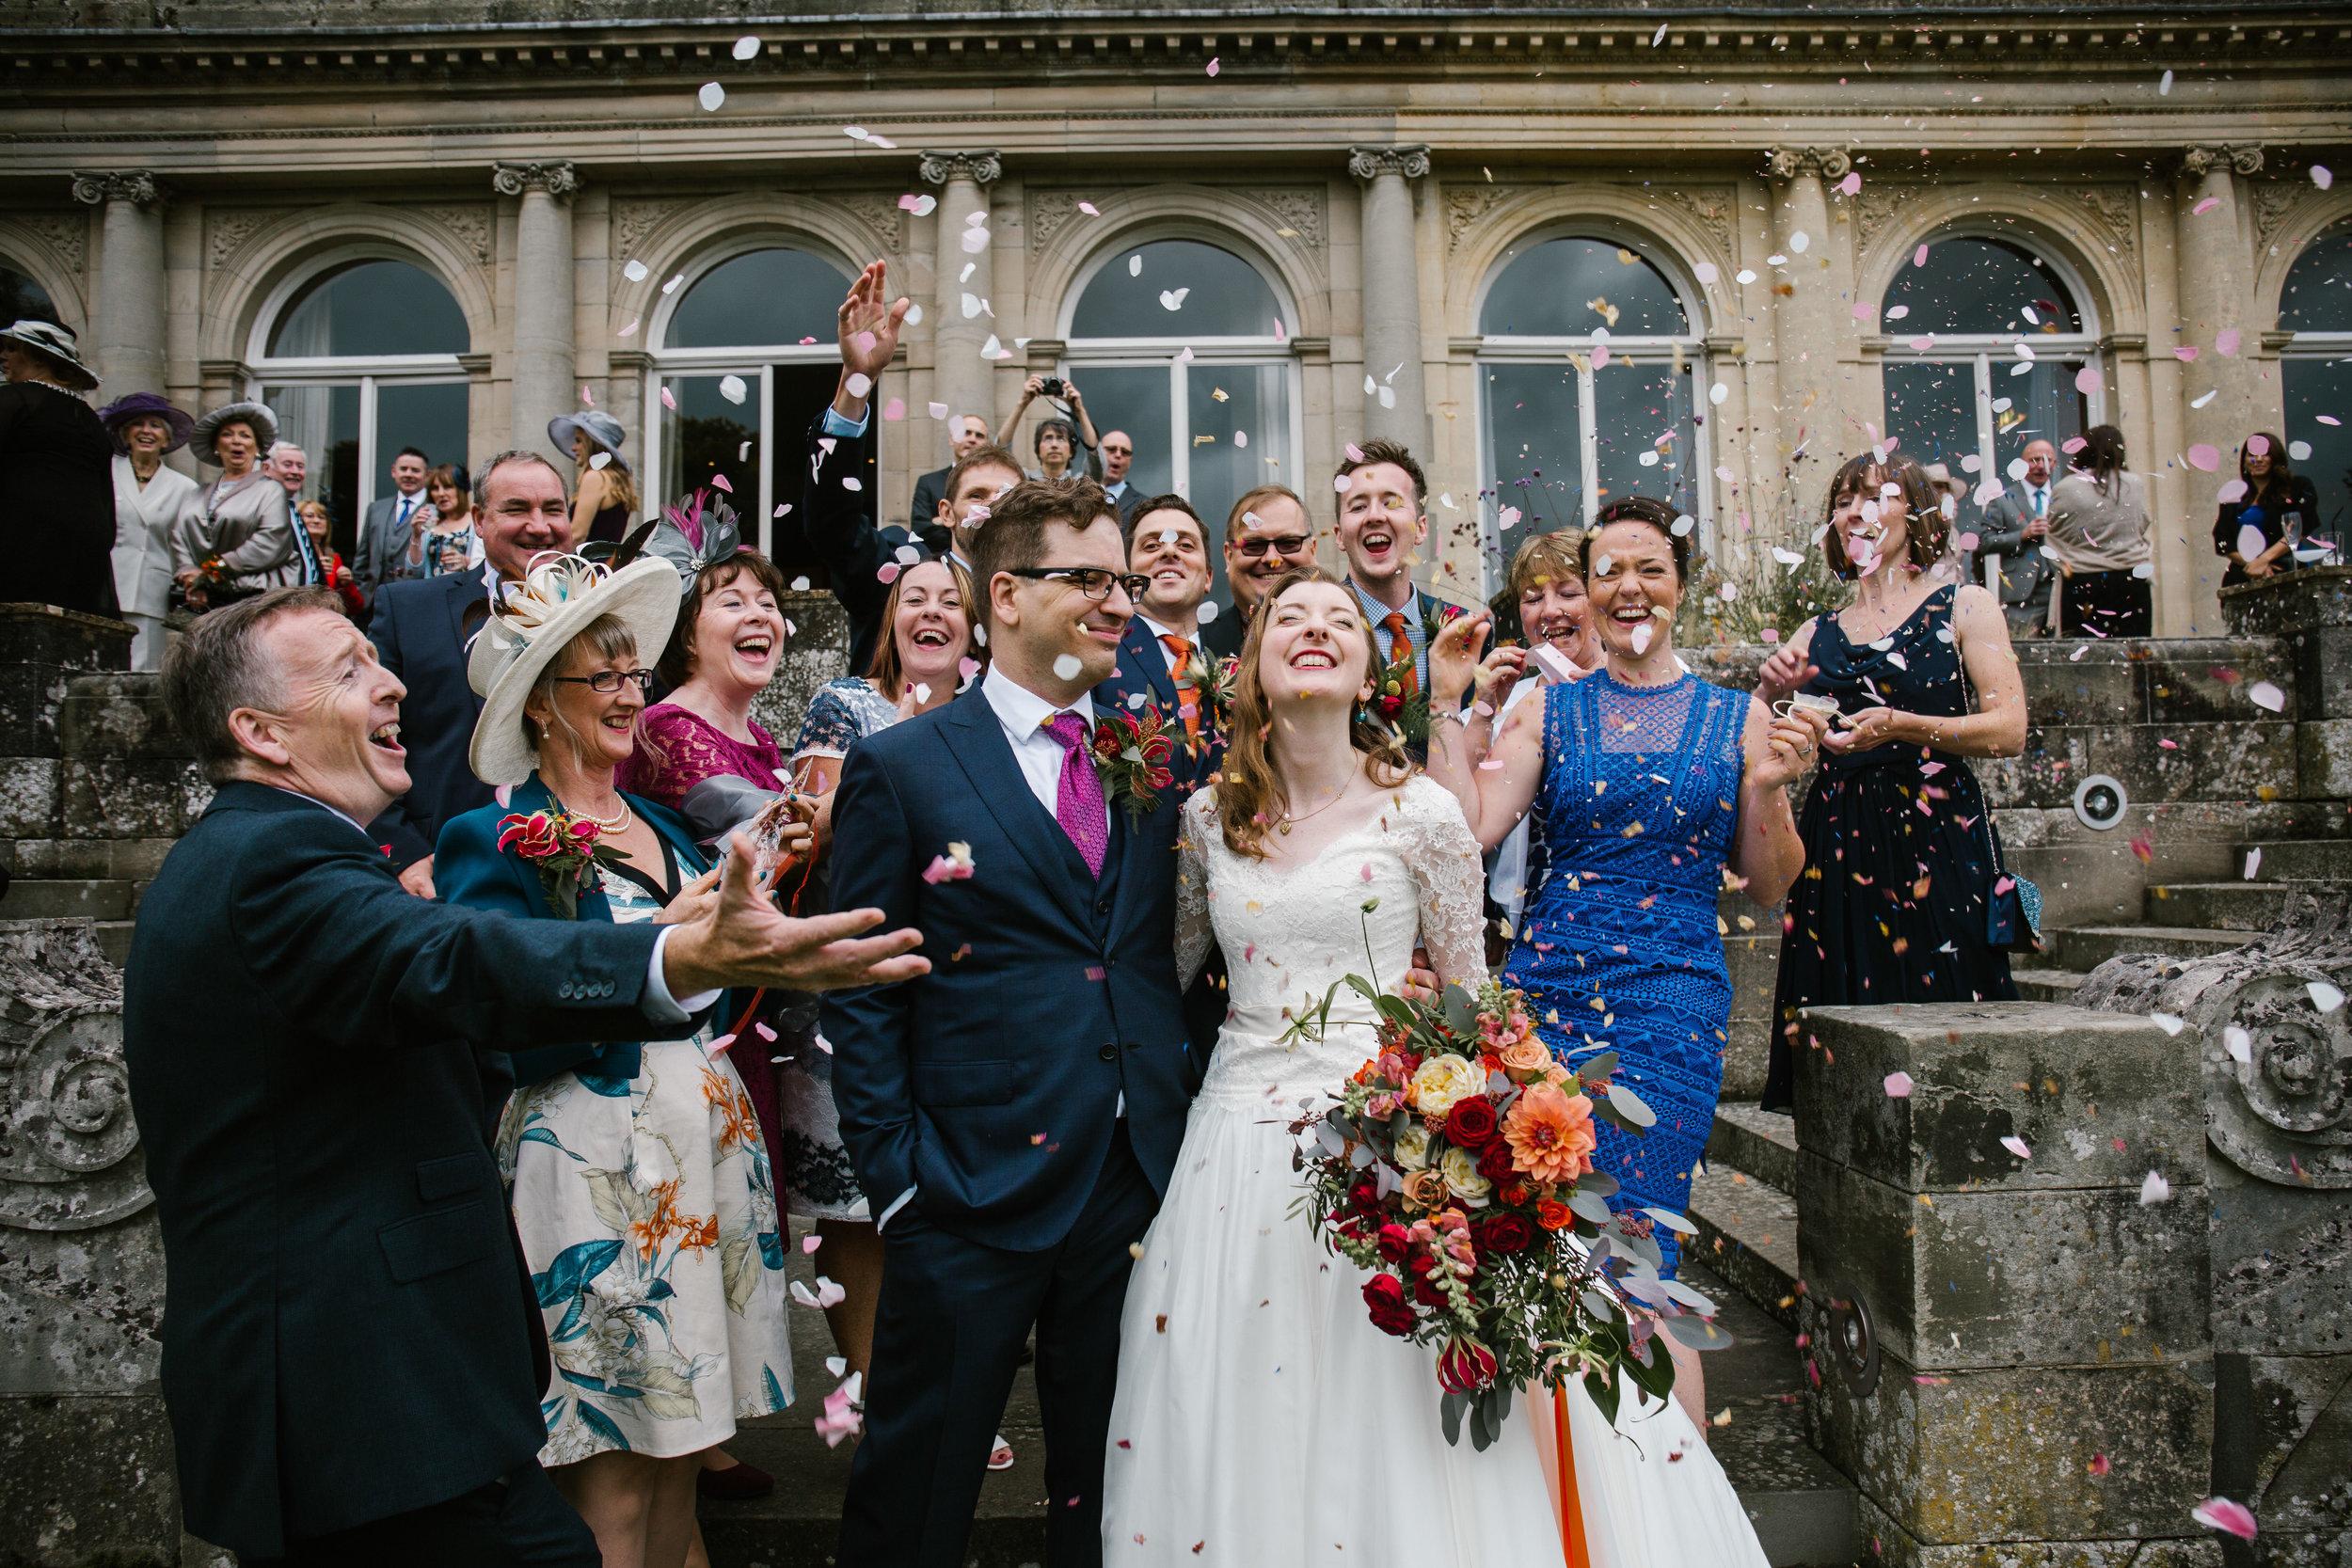 Cowley Manor, Cowley Manor weddinf, Cowley Manor wedding photographer, Cotswolds wedding, Cotswolds wedding photographer, staffordshire wedding photographer, autumn wedding, autumn wedding ideas-233.jpg